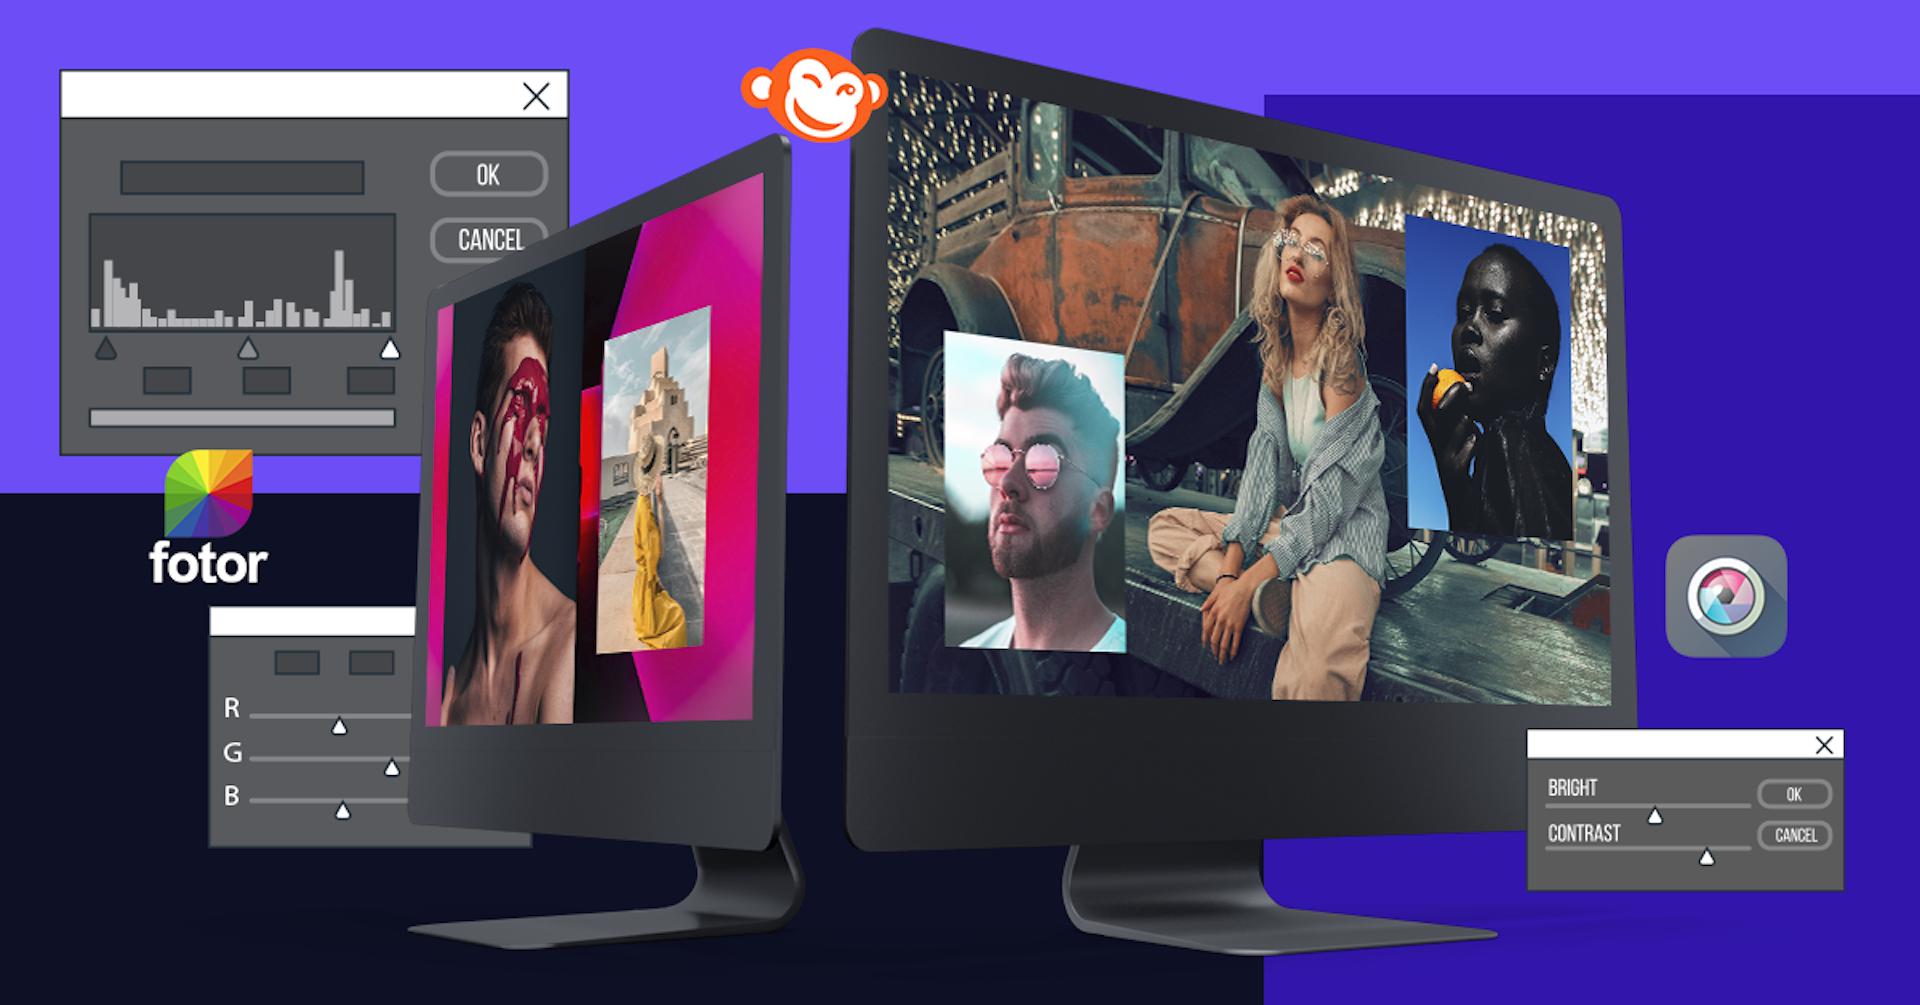 Comparamos Photoshop con estos 10 programas para editar fotos gratis